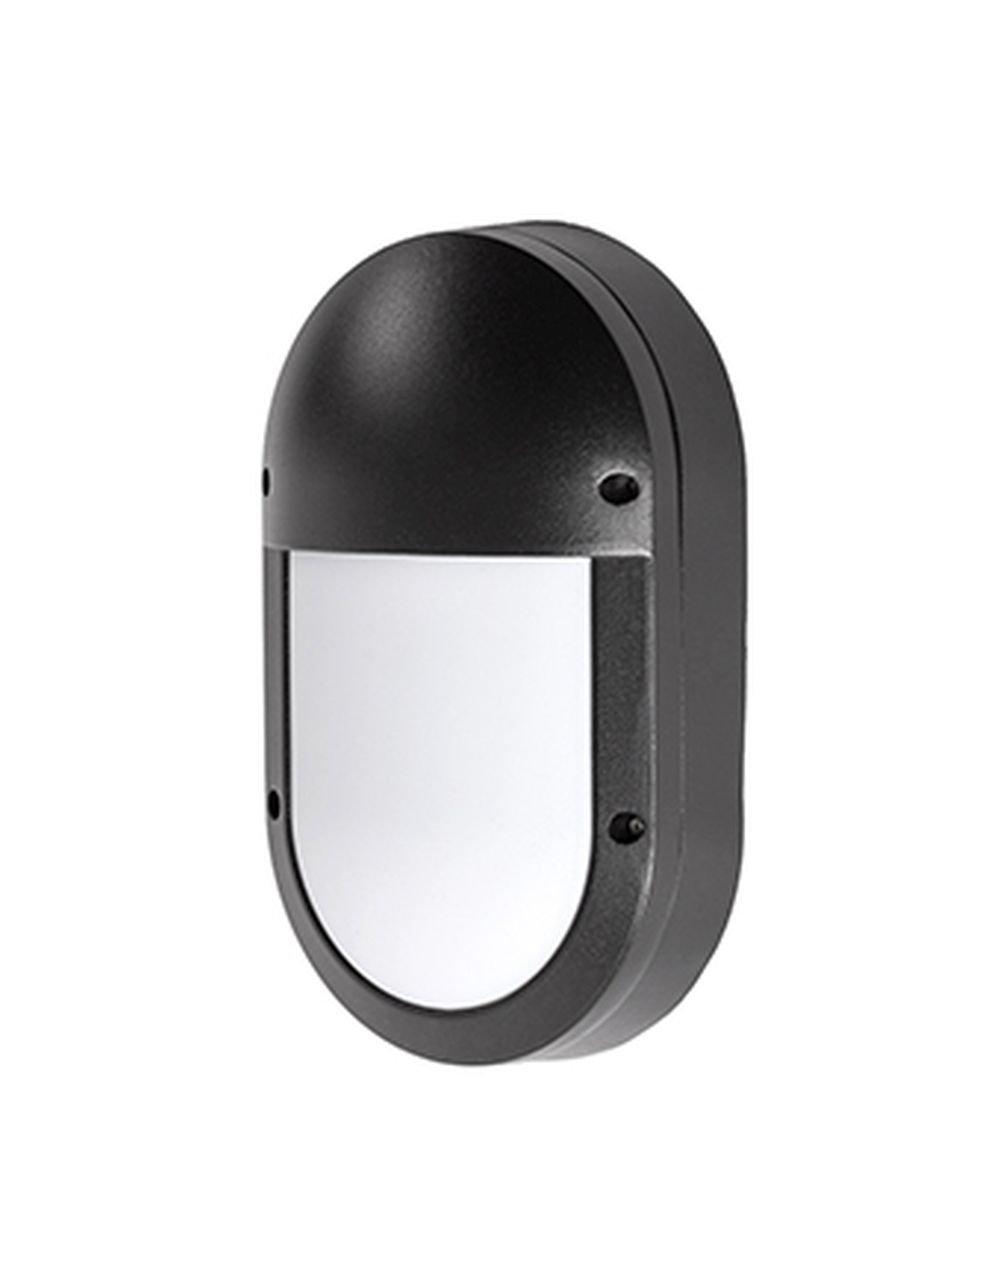 Radionic Hi Tech K_OS_5928 Gretchen 5.25'' 1 Light Black Outdoor Sconce Gretchen 1 Light Outdoor Sconce, 5.25'',Black